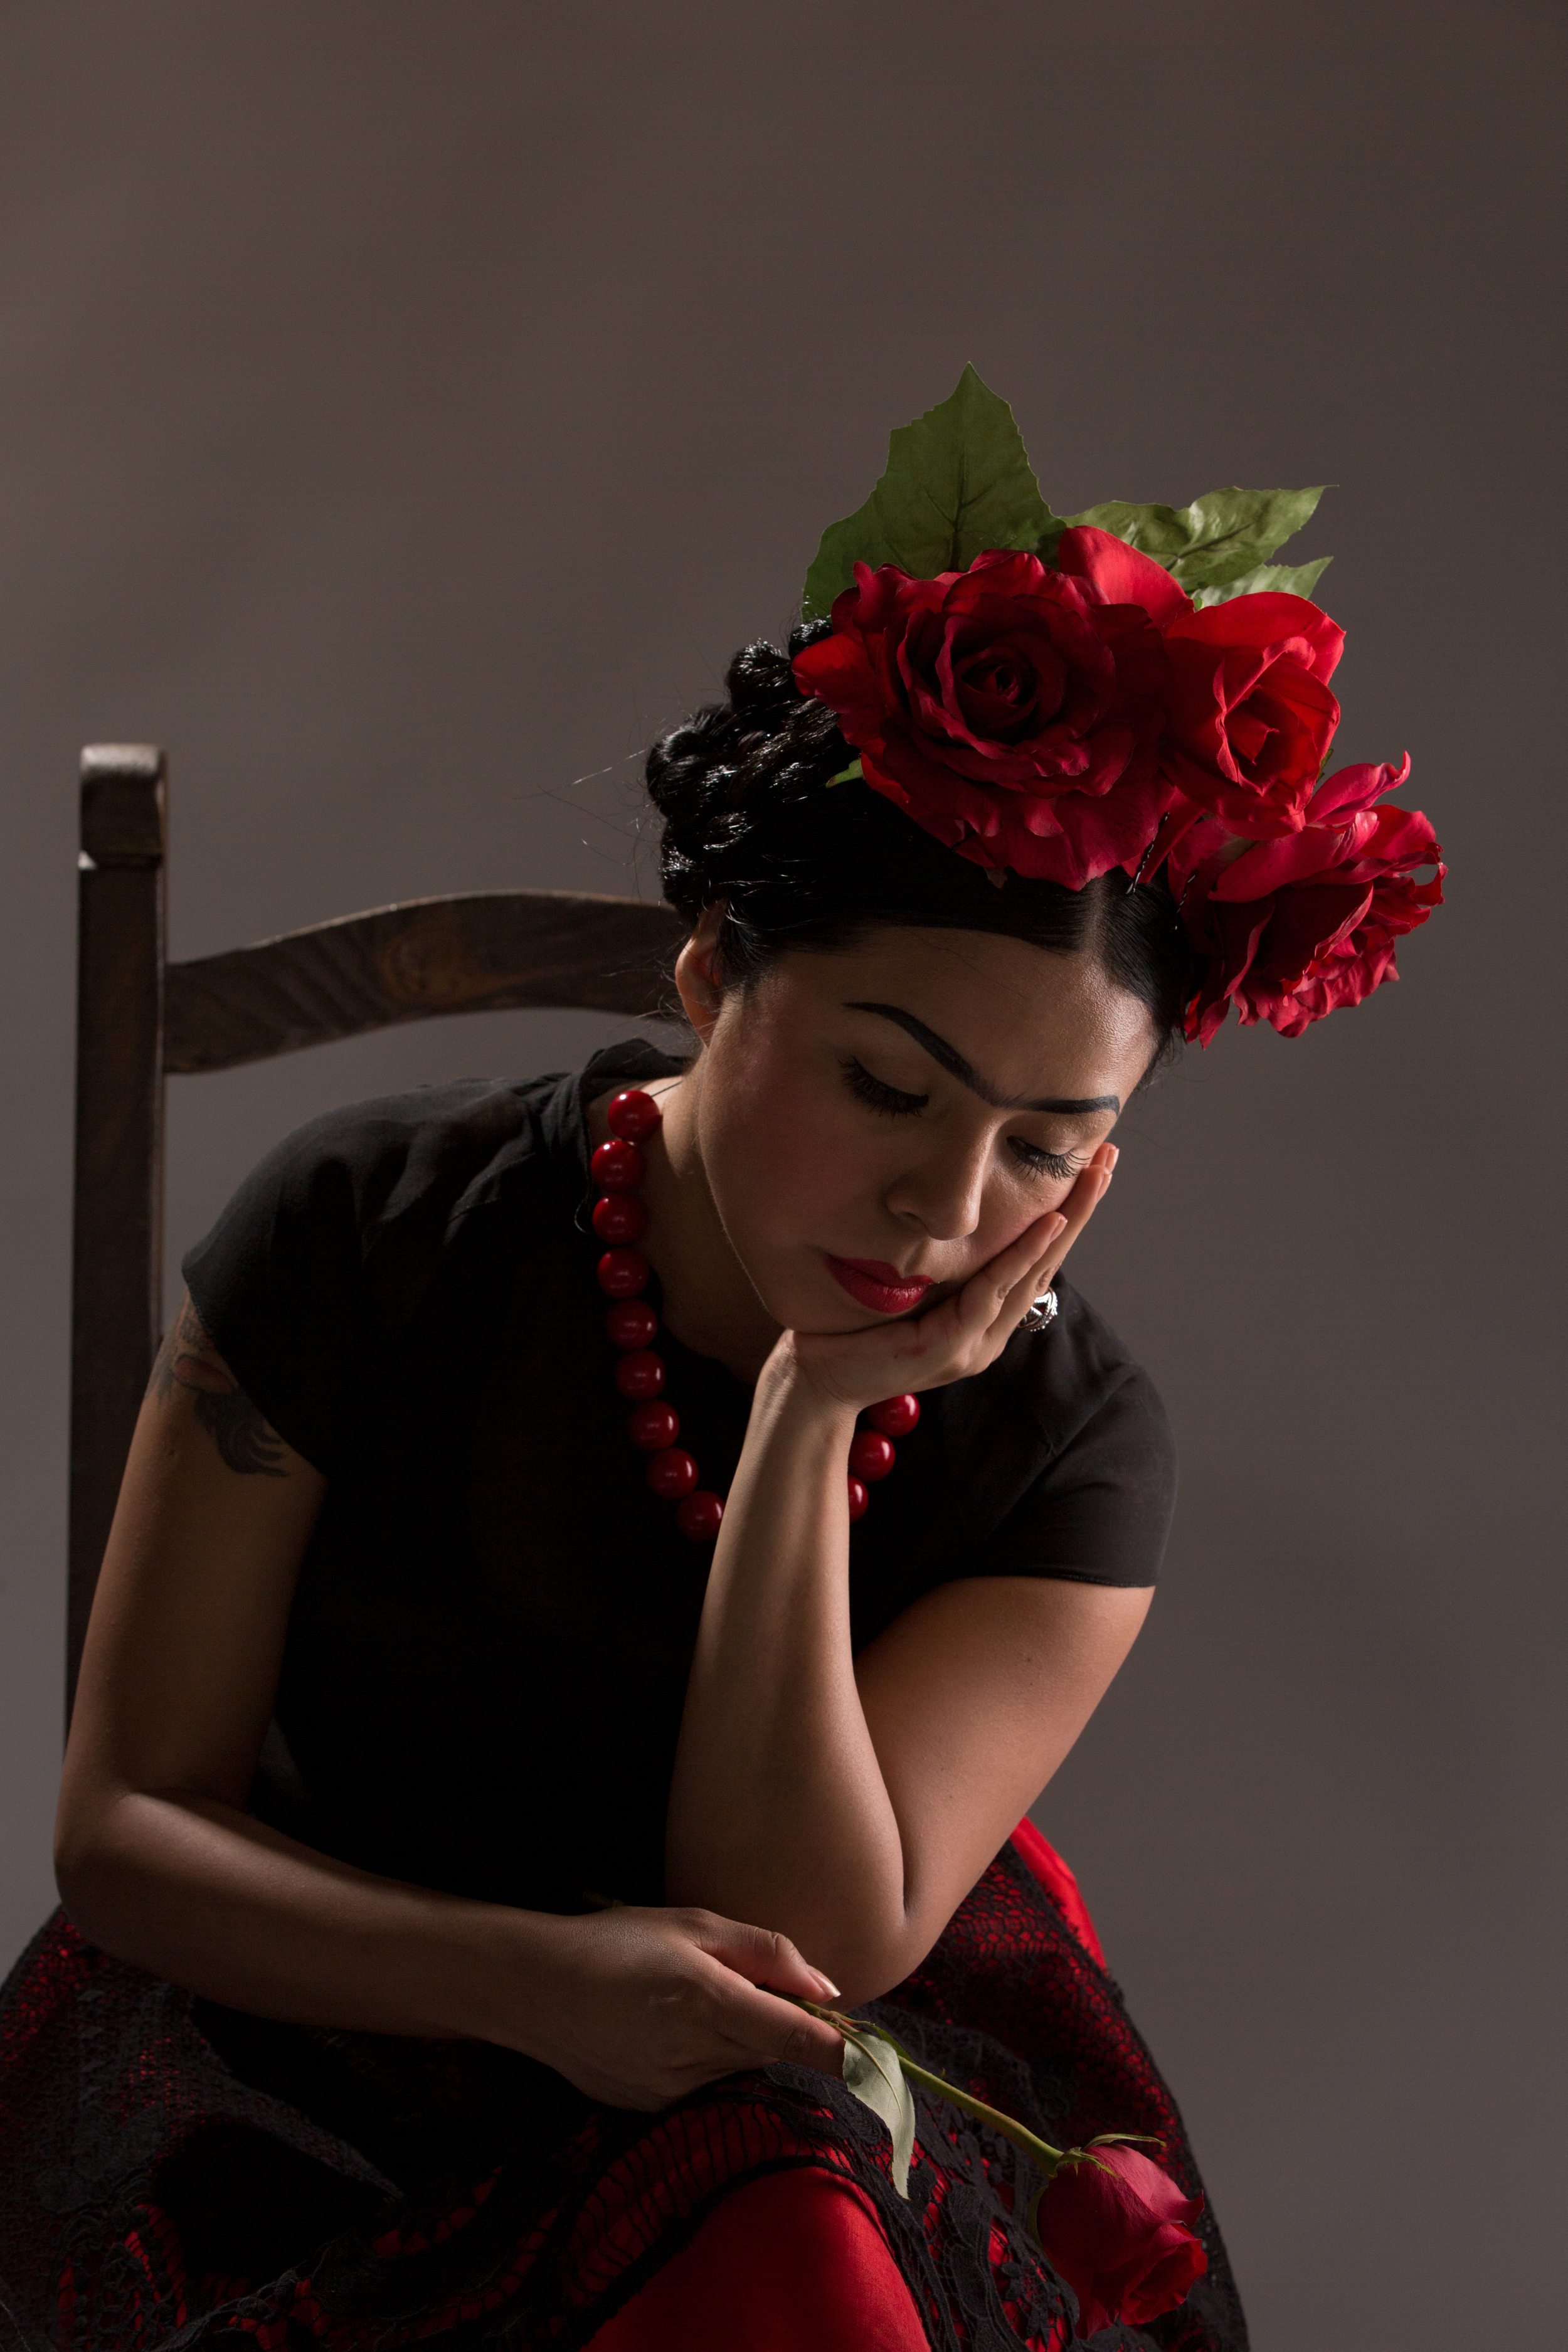 Frida-1-3.jpg